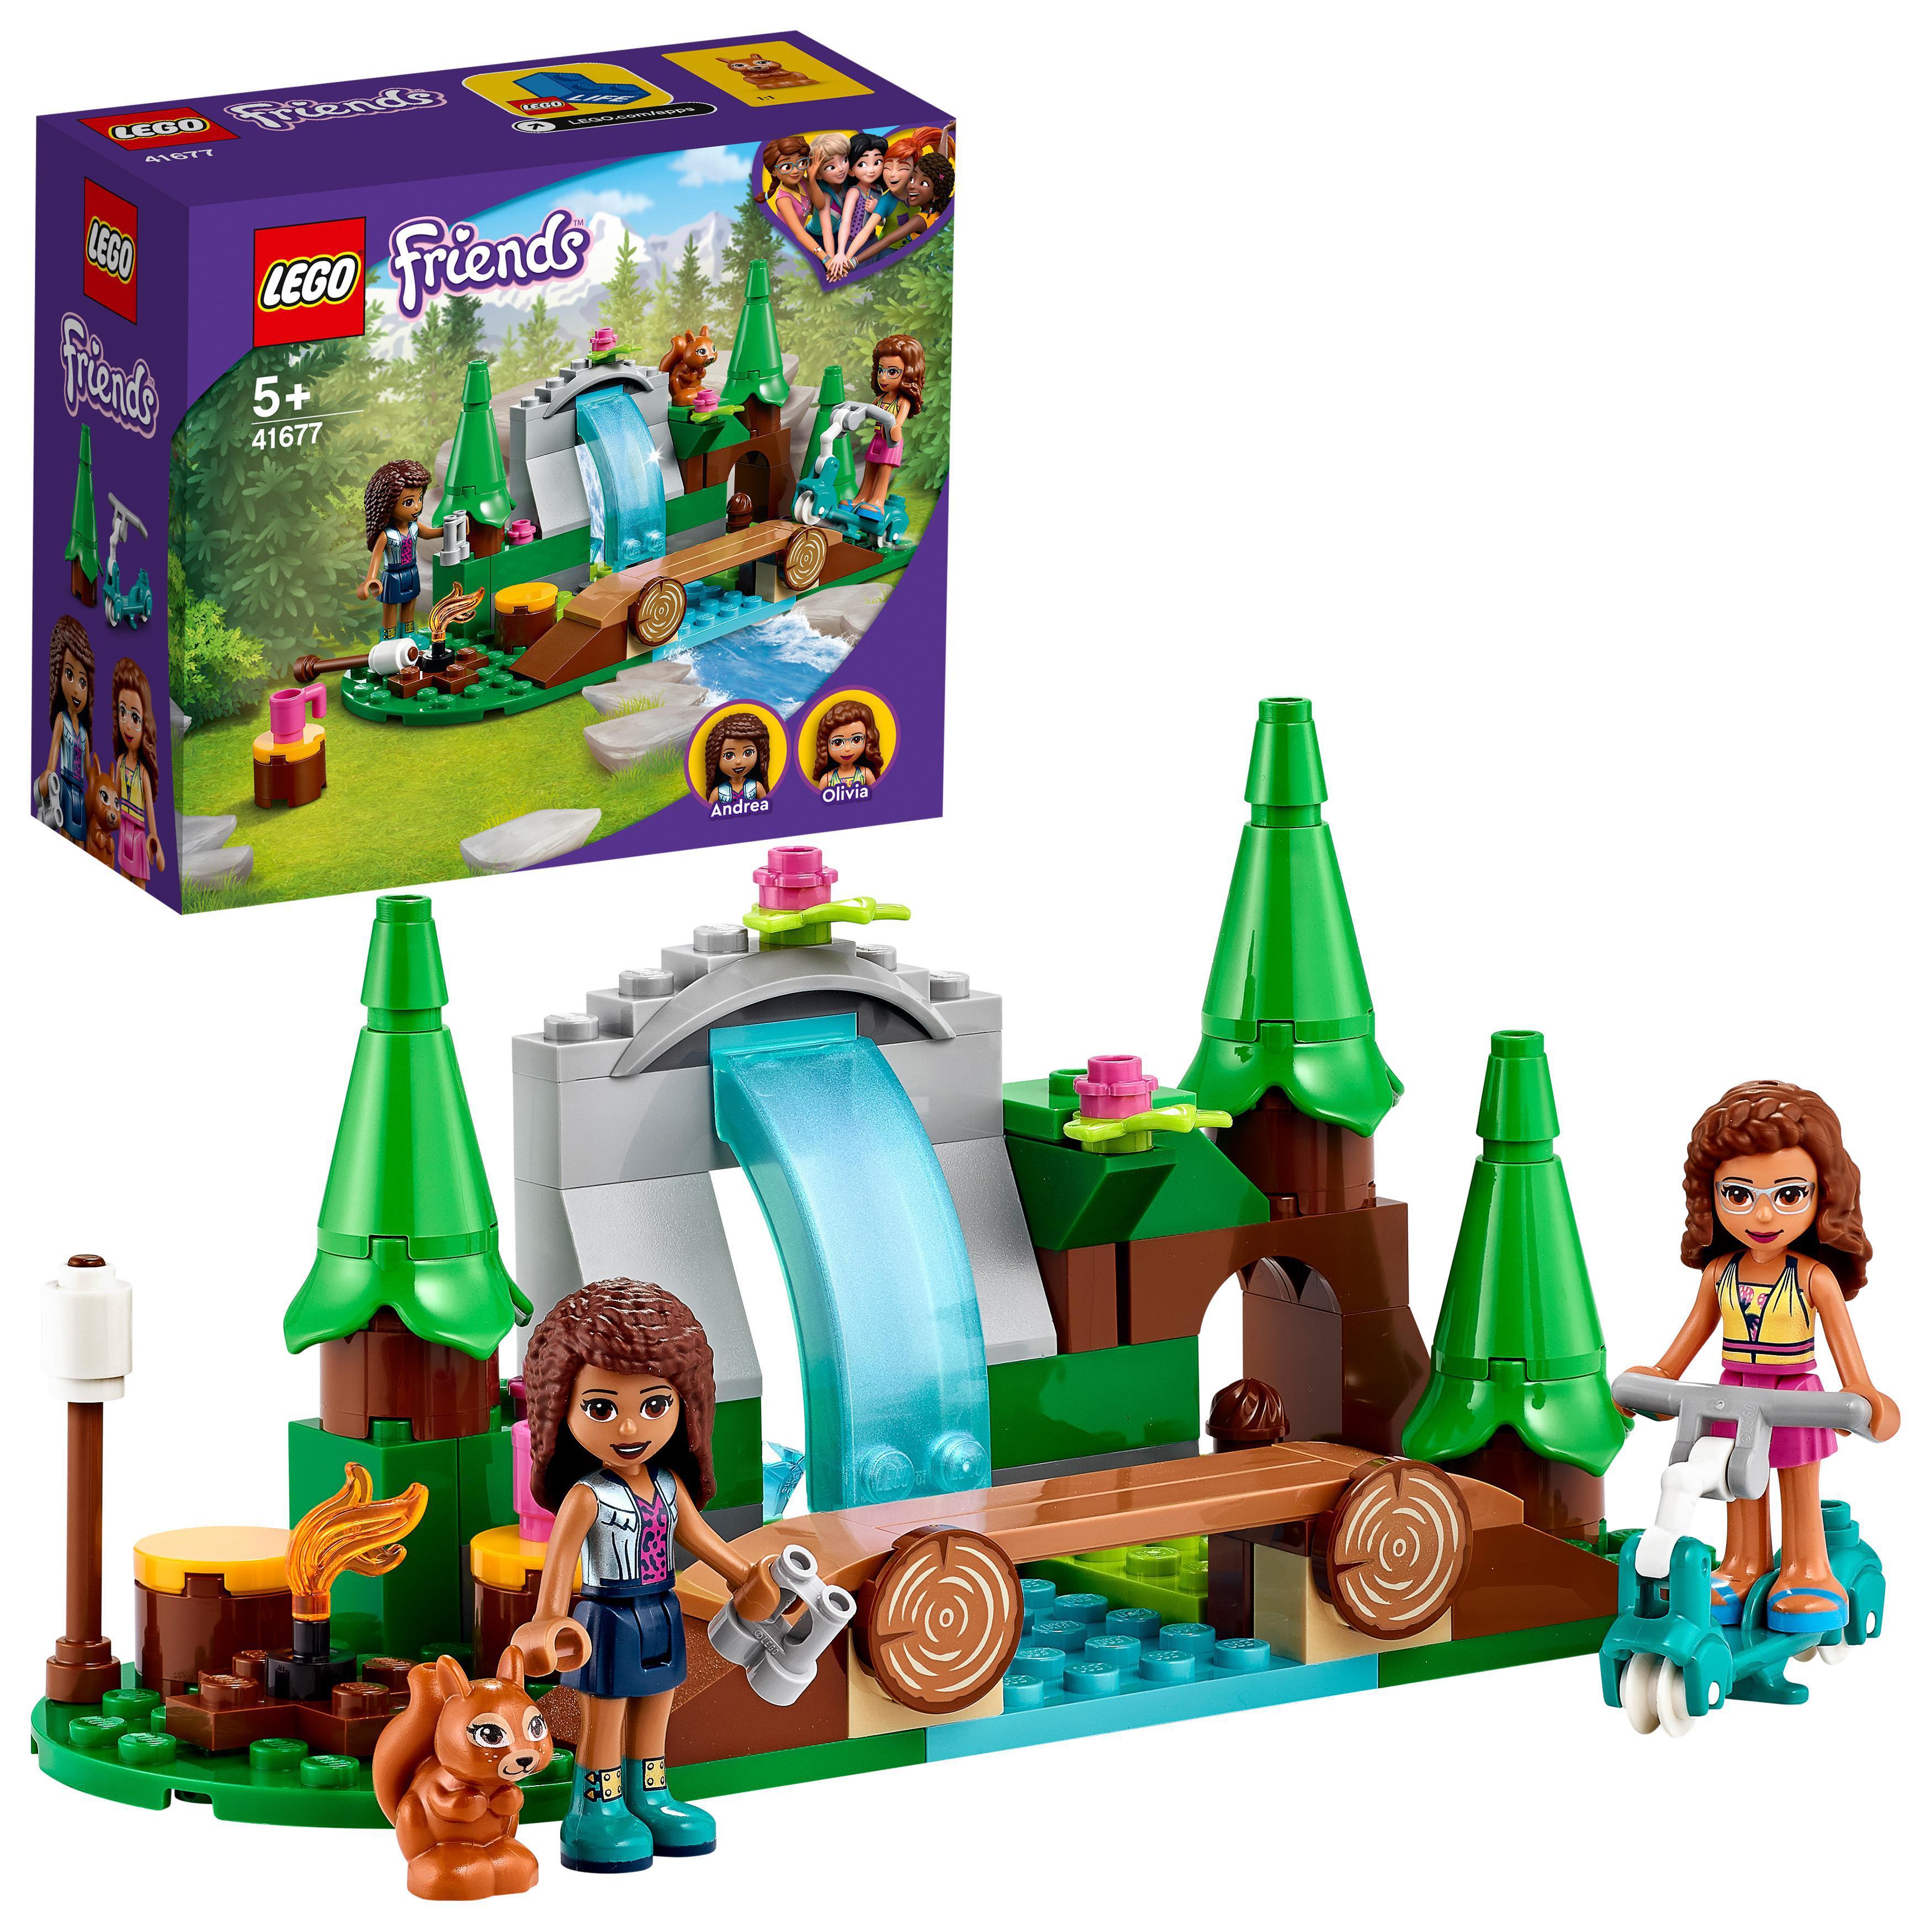 LEGO Friends - Forest Waterfall (41677)